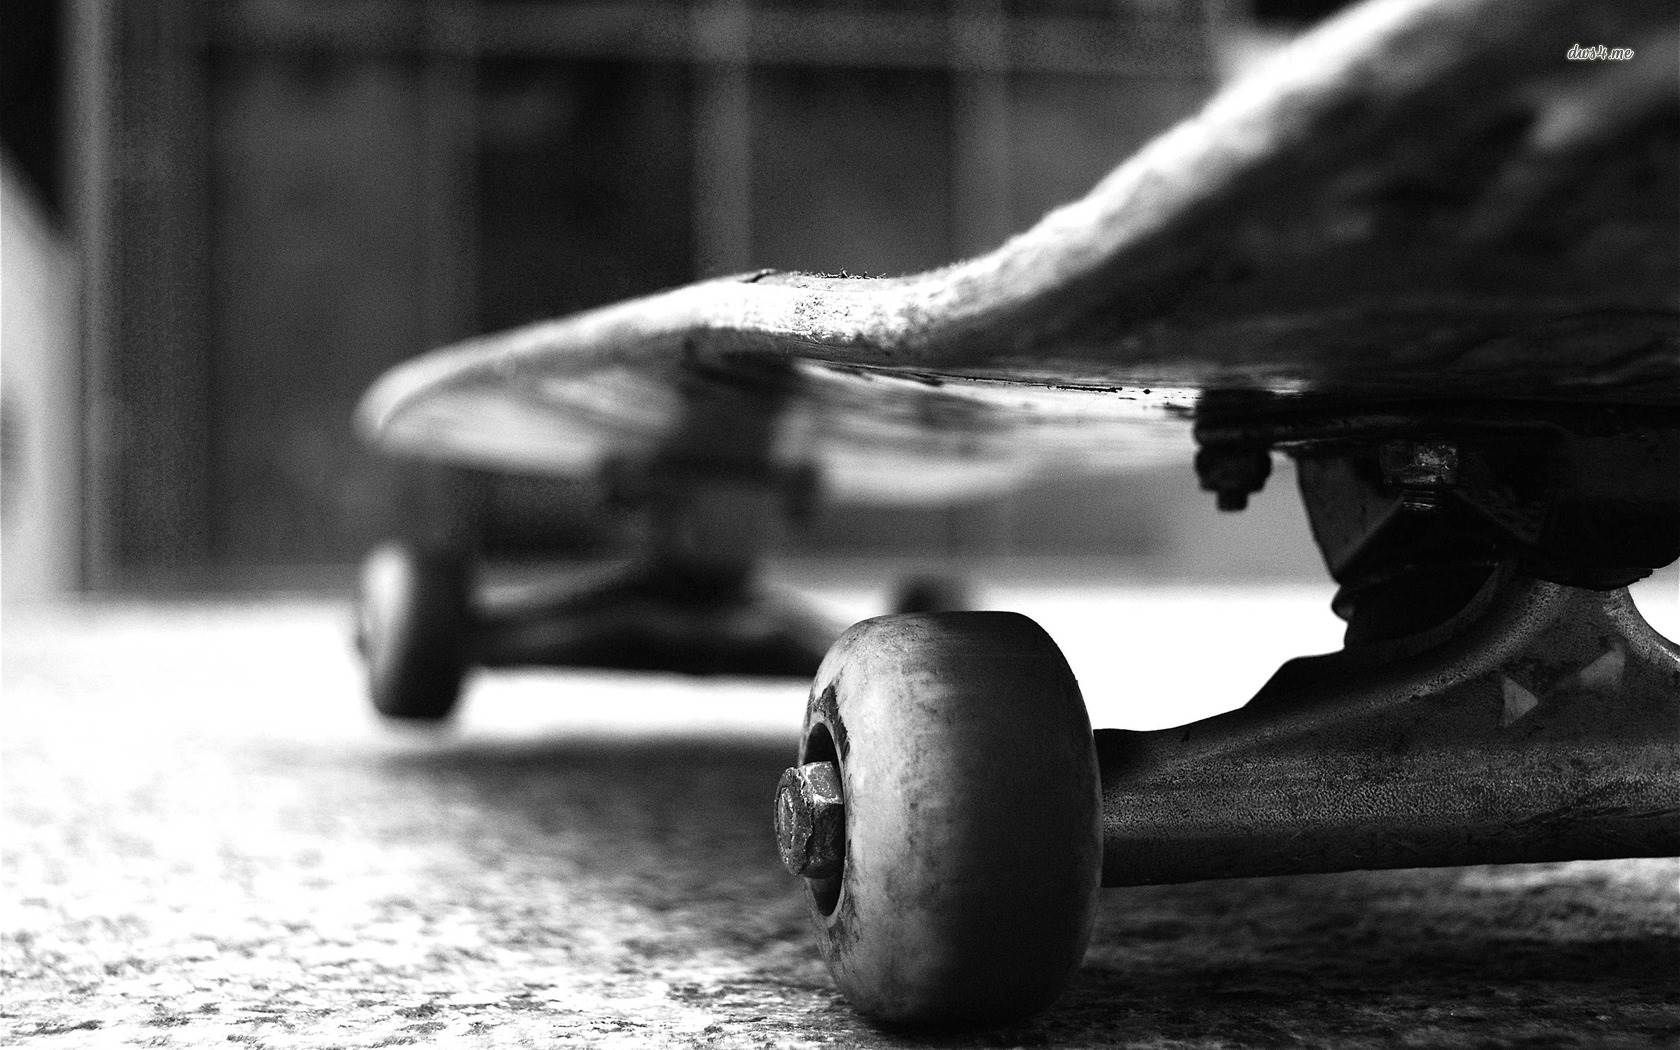 Skateboarding HD Wallpapers Backgrounds Wallpaper 16801050 1680x1050